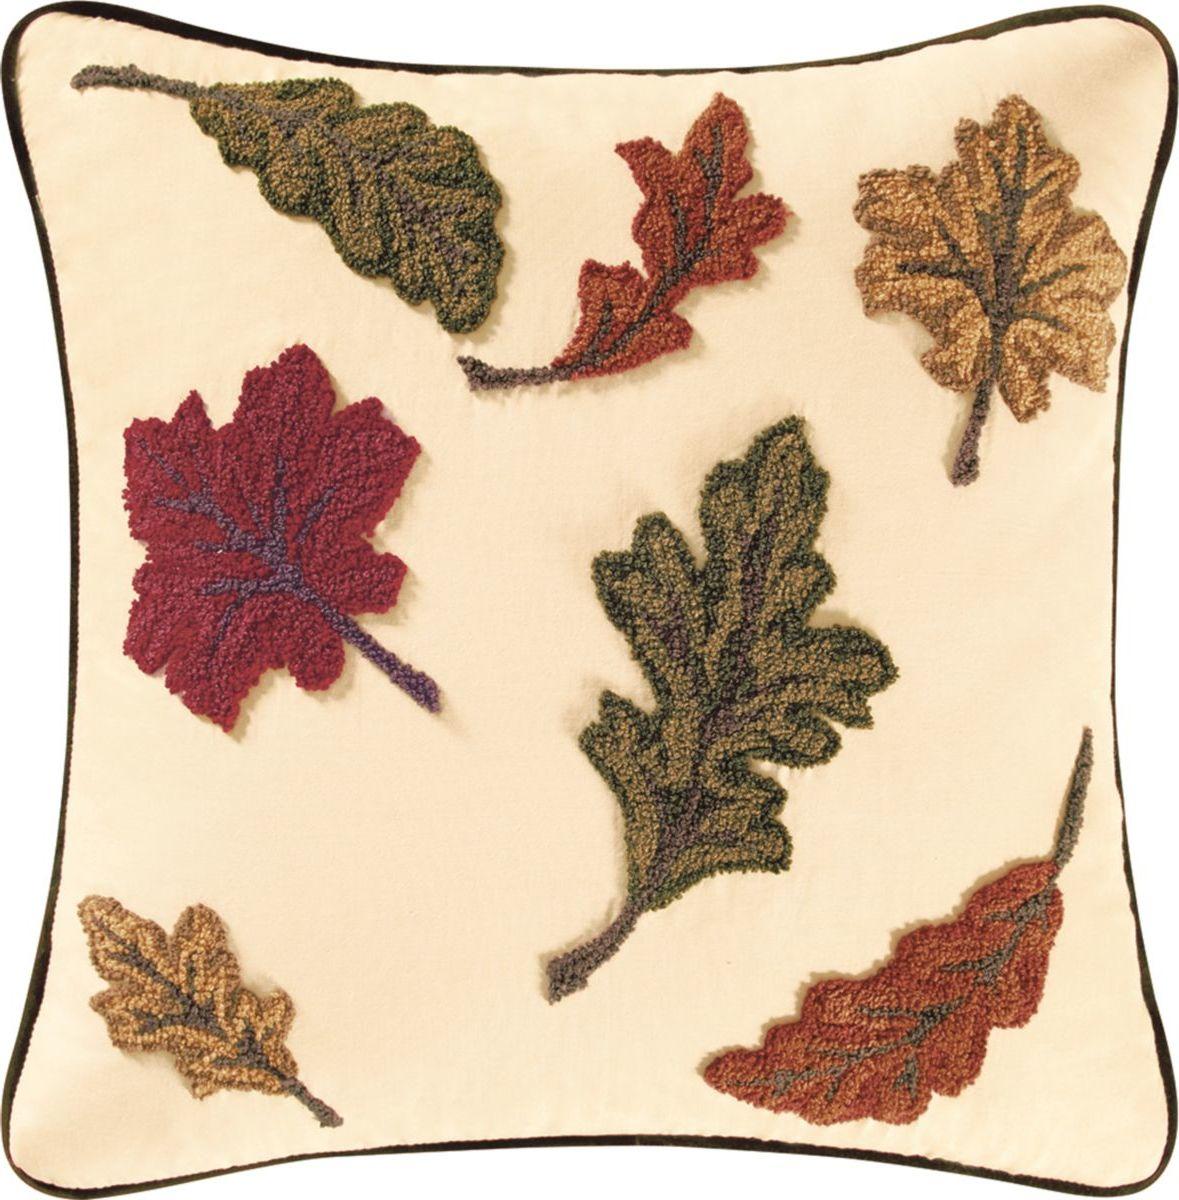 C&F Design Cabin Nights – Decorative Pillows